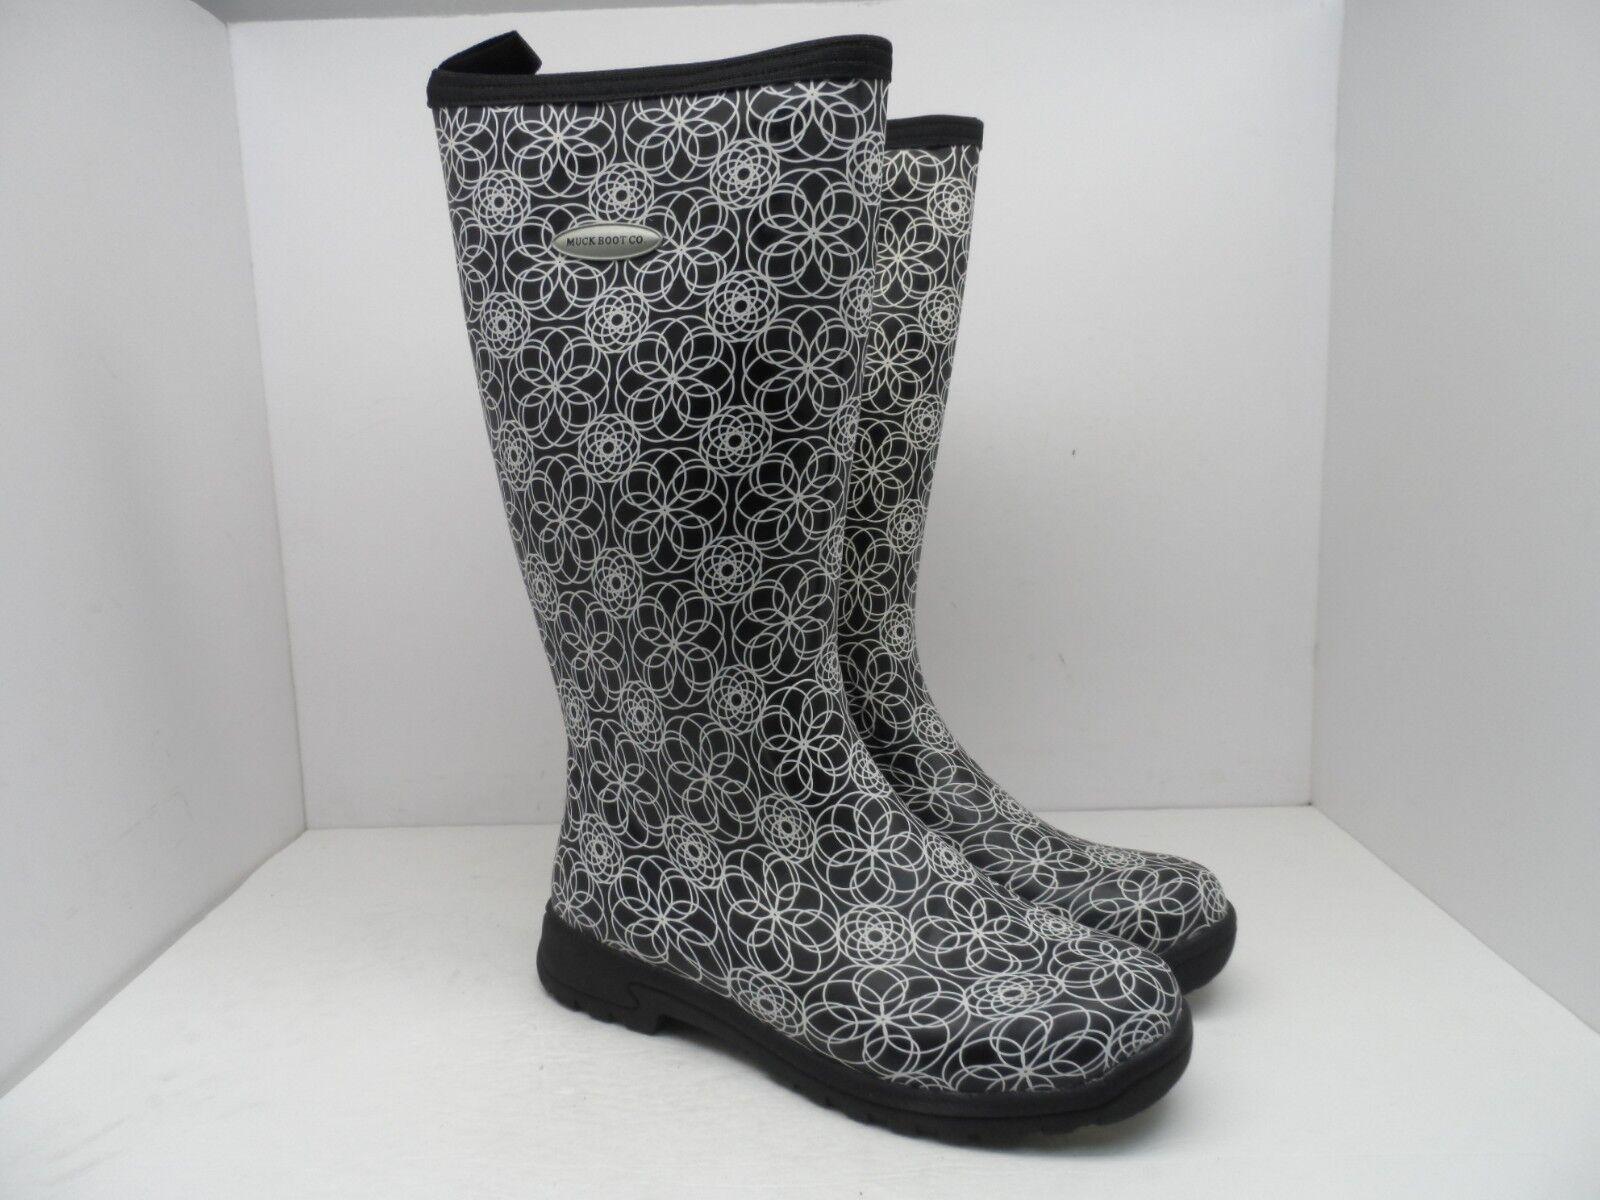 Muck Boots Women's Breezy Tall Insulated Rain Boot BZT-SWL Swirl Print Black 11M